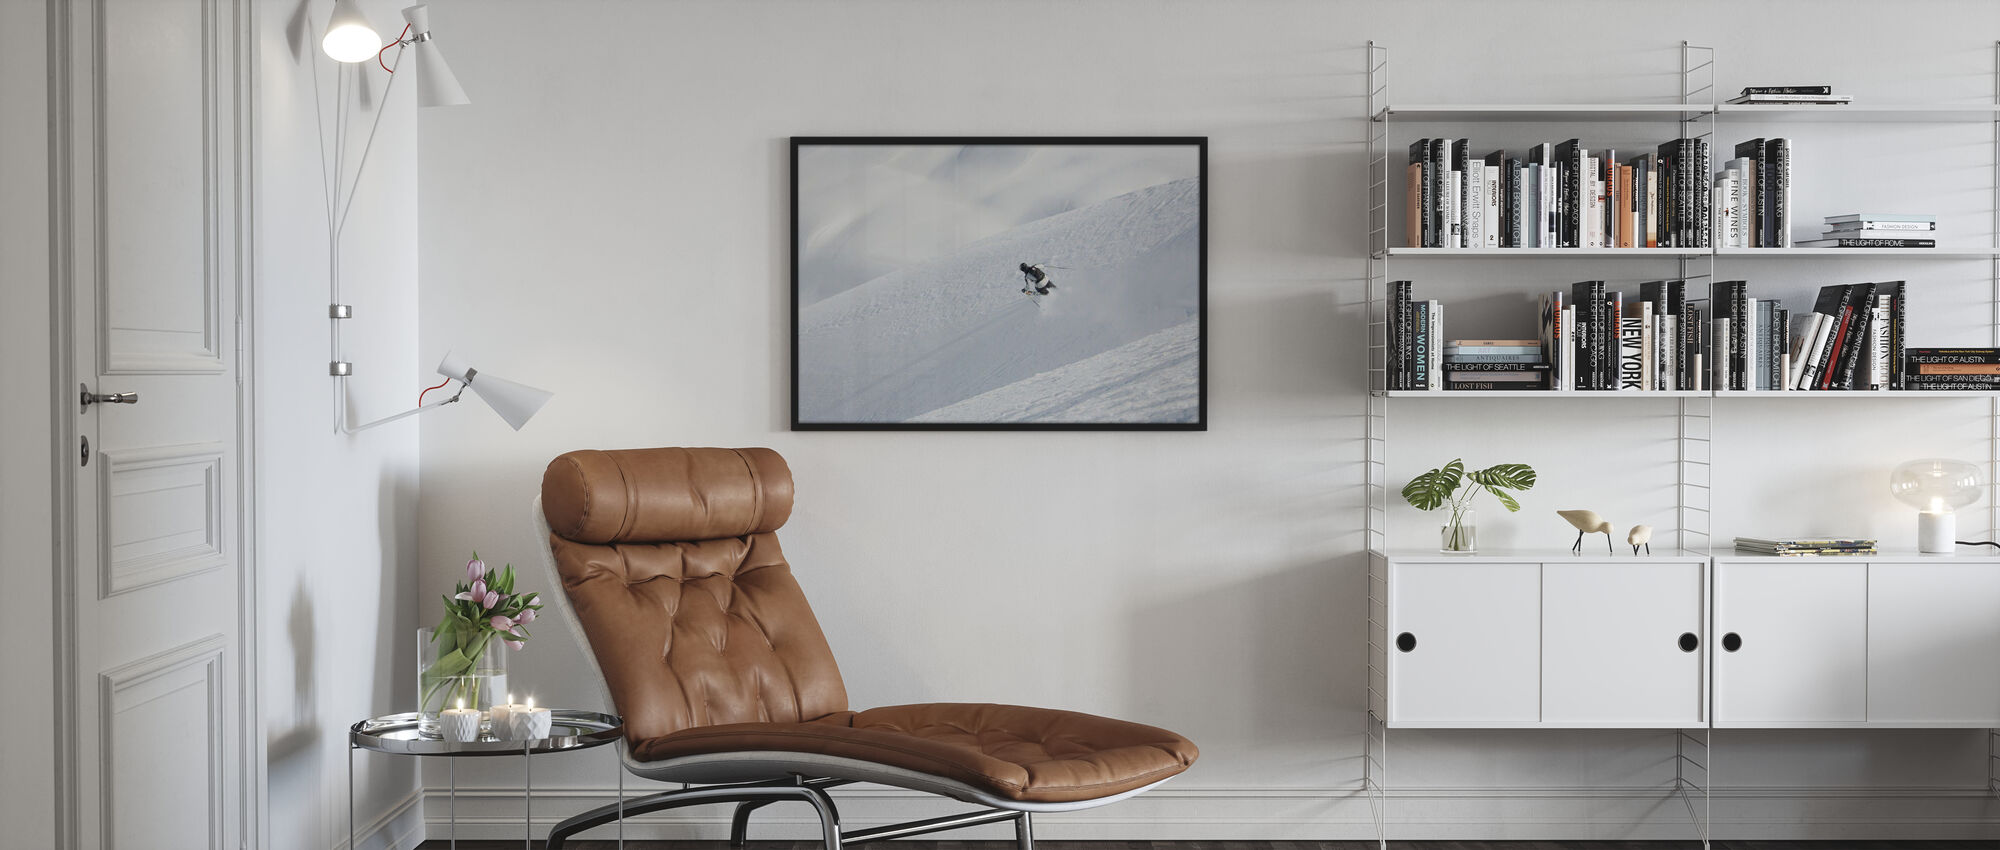 Off Piste Skiing in Chamonix, France, Europe - Poster - Living Room